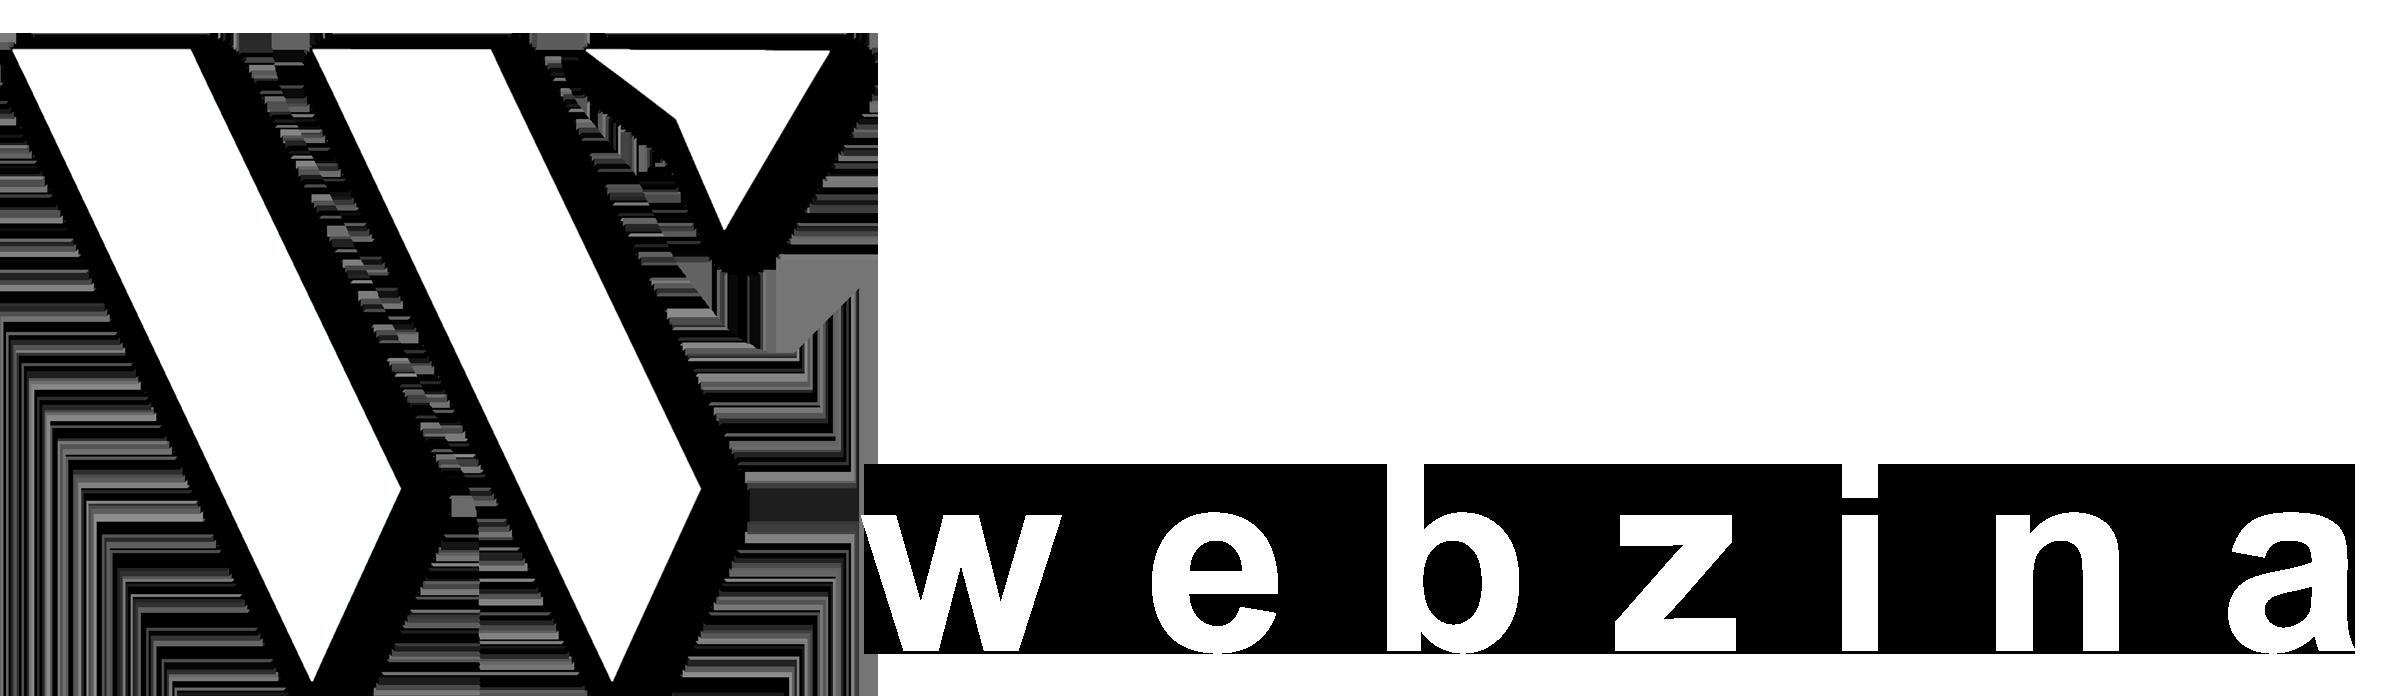 Web design Webzina - Brasov WebDesign